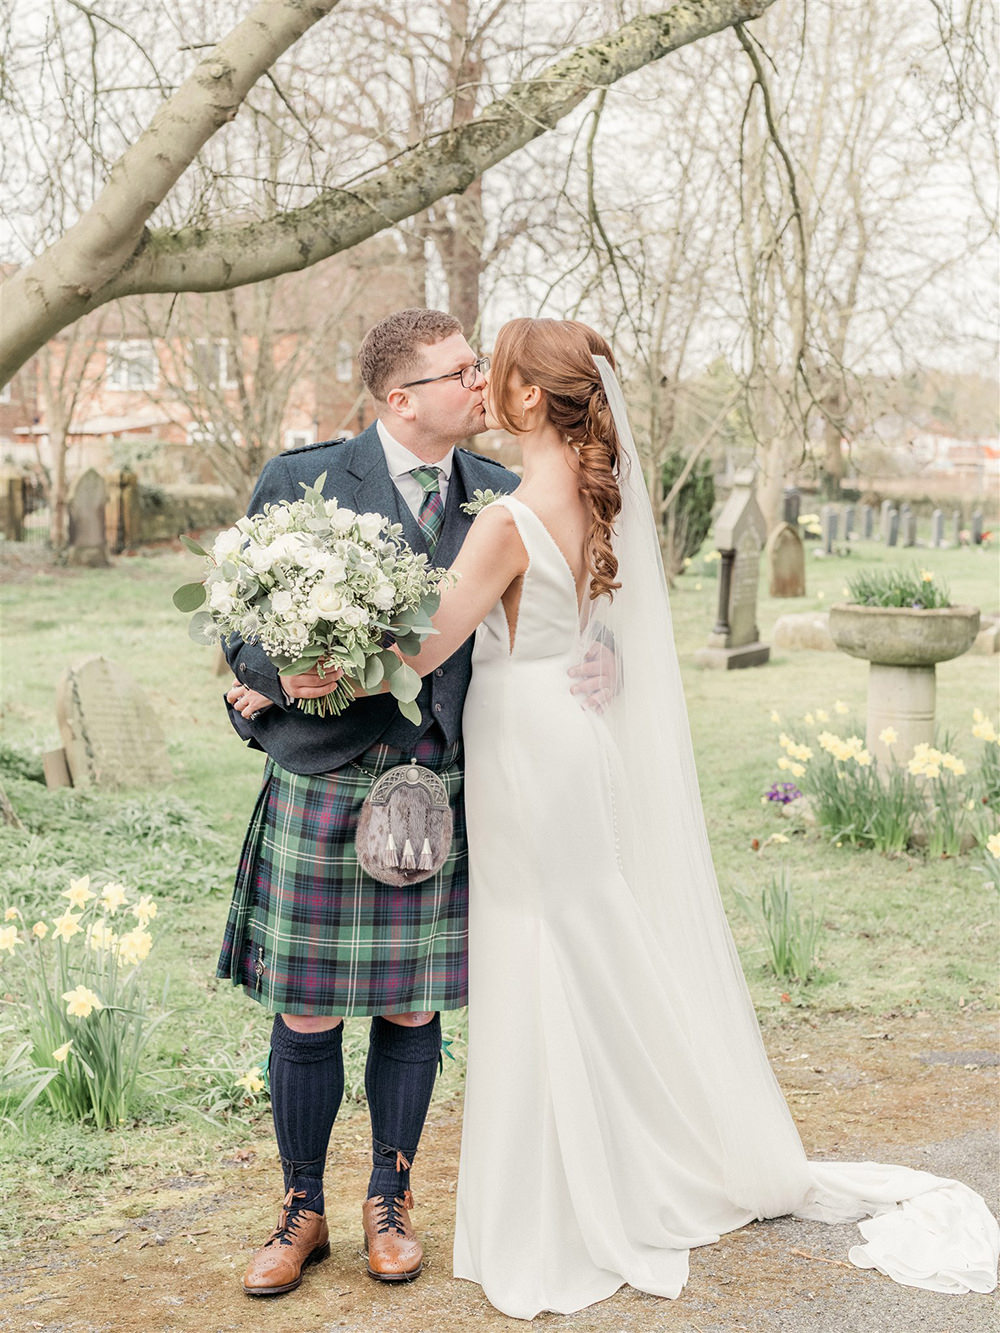 Lockdown Wedding Carn Patrick Photography Dress Gown Bride Bridal Pronovias Straps